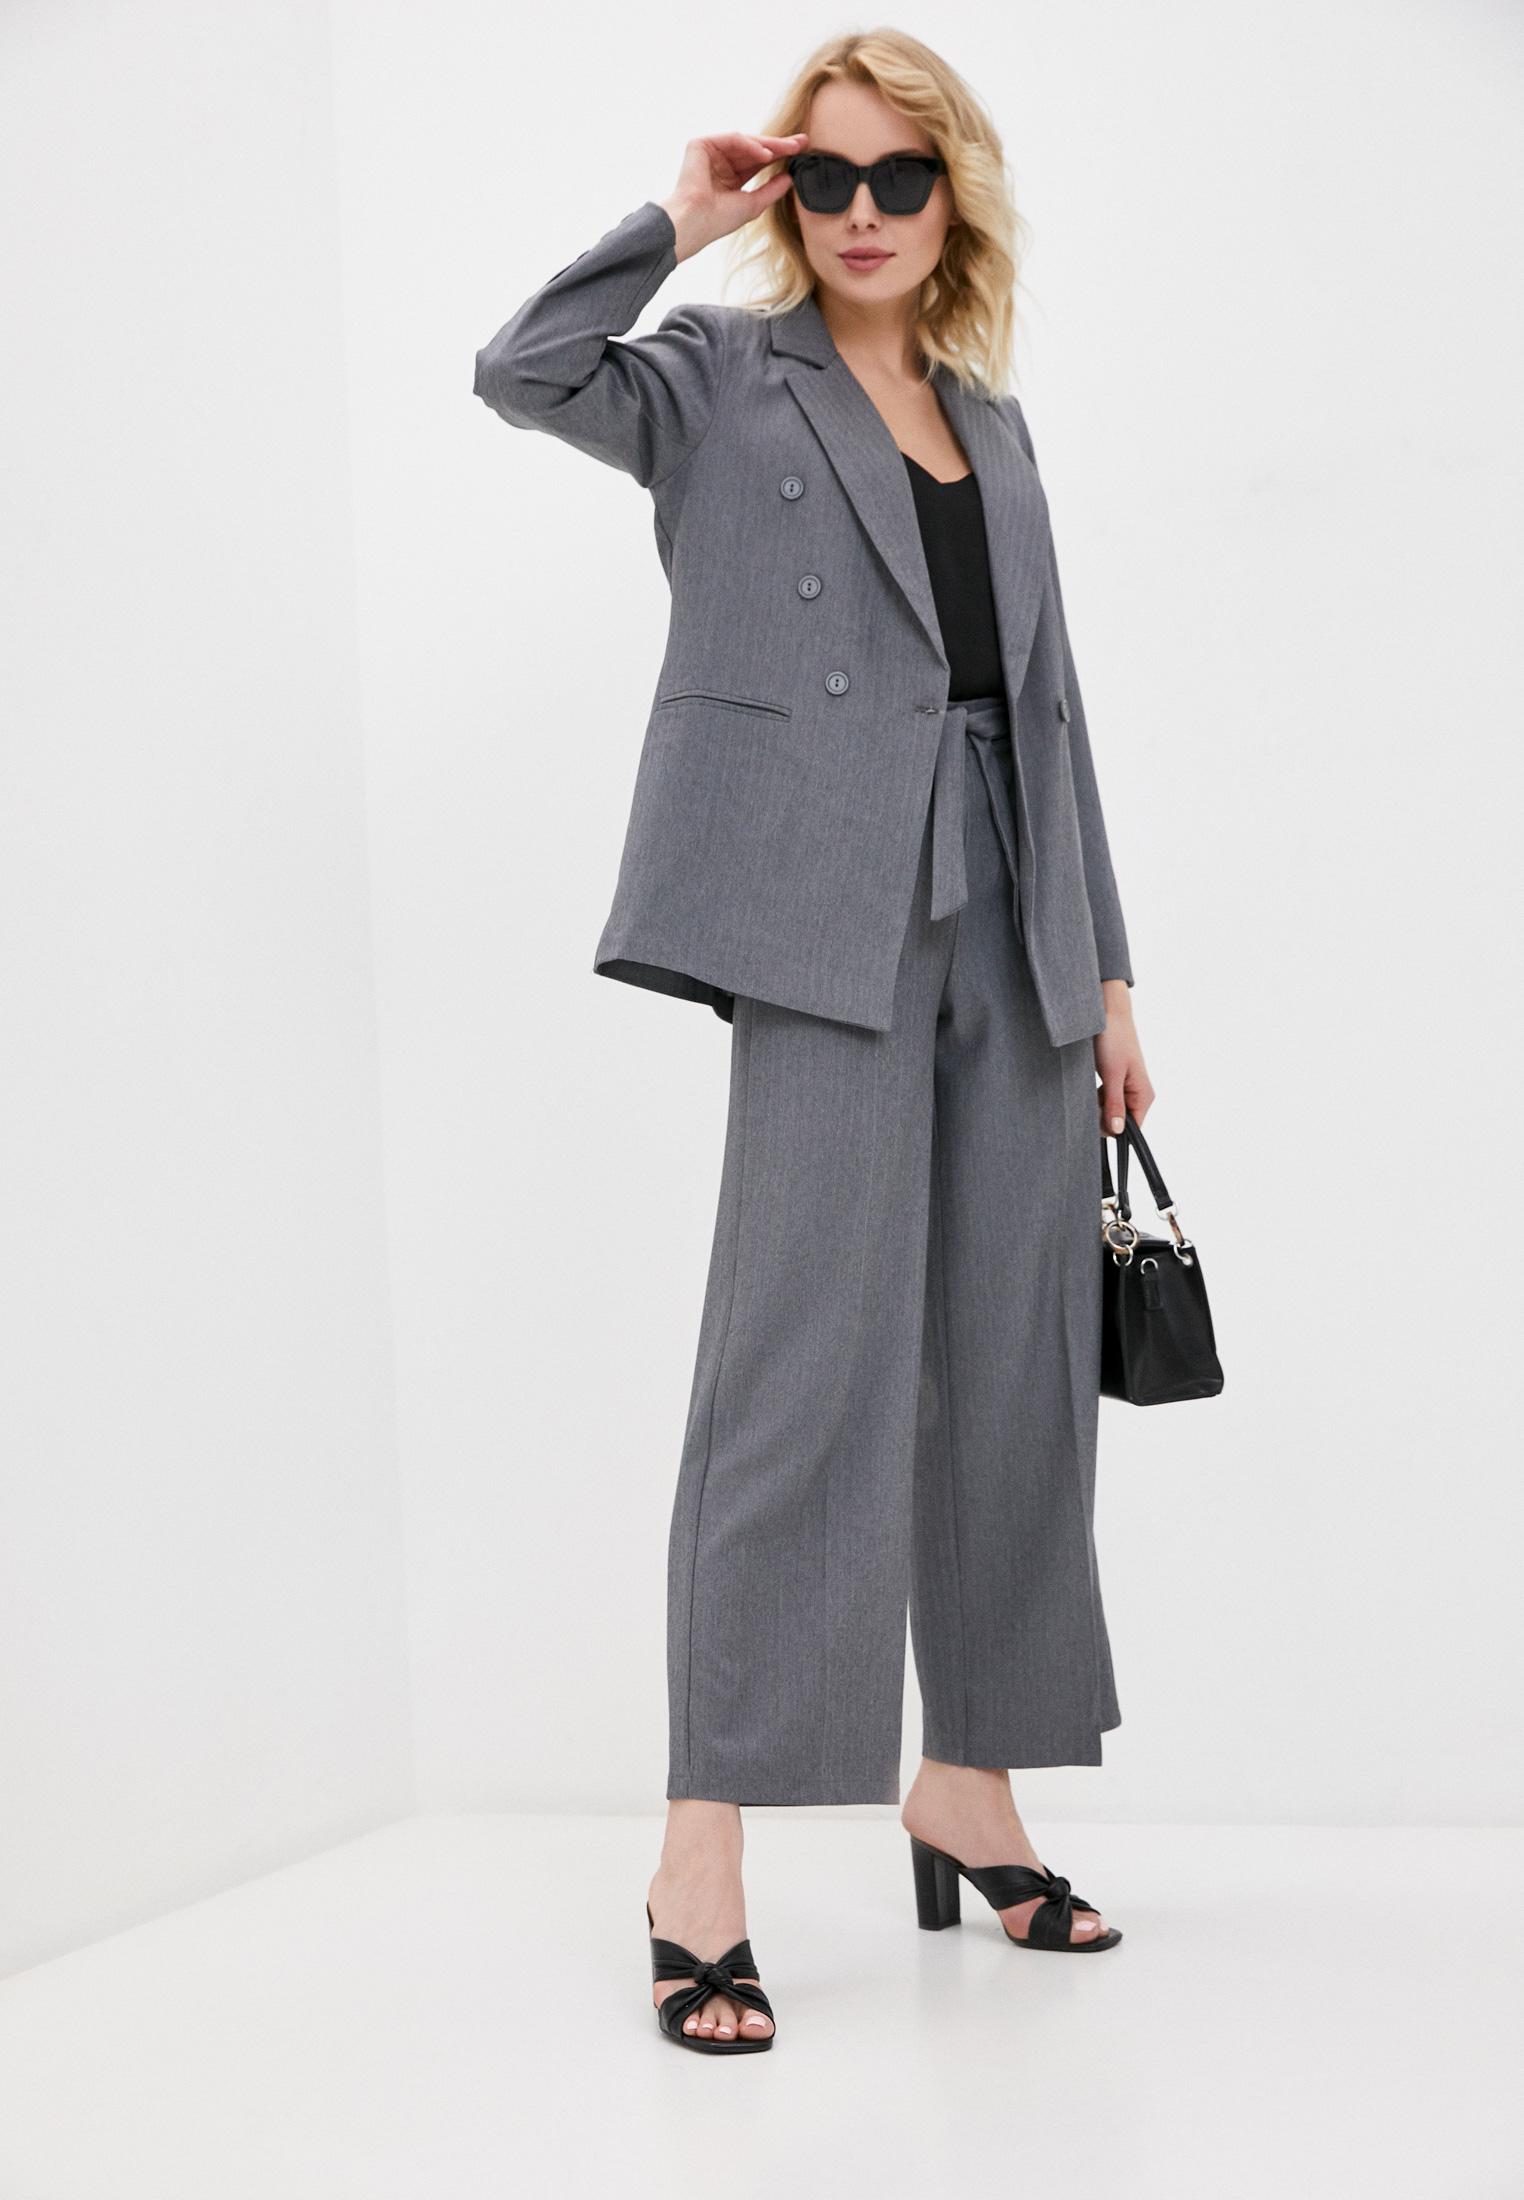 Костюм с брюками Dunia DU21-60